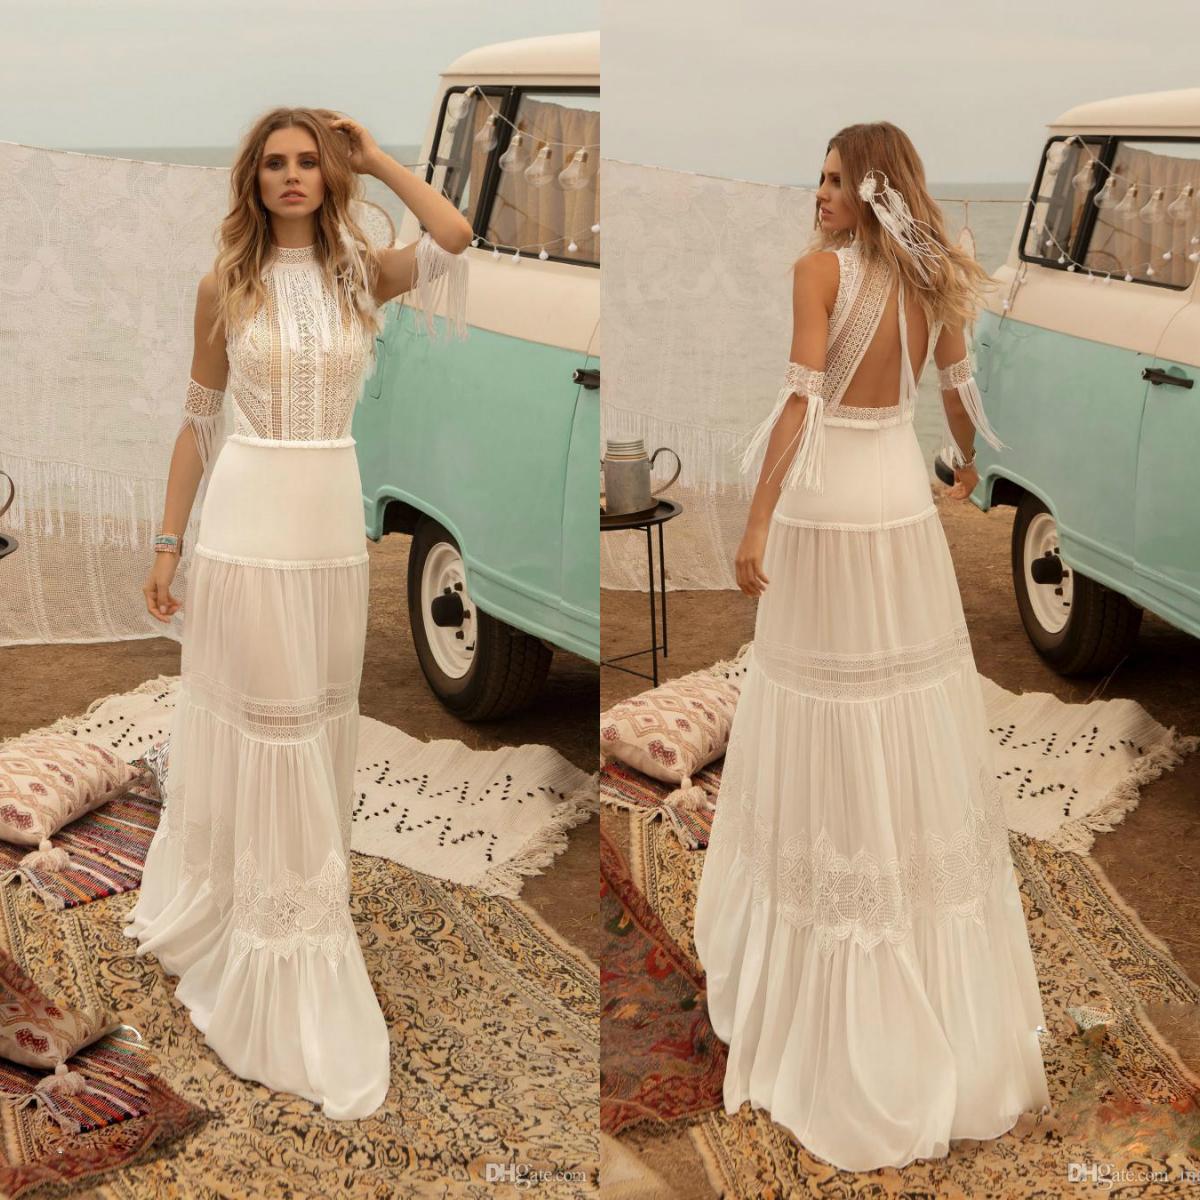 2020 Últimas Tassel vestido de casamento vestidos de alta Neck Lace Appliqued Chiffon A Linha de Vestido de Noiva bohemian casamento Robes De Mariée